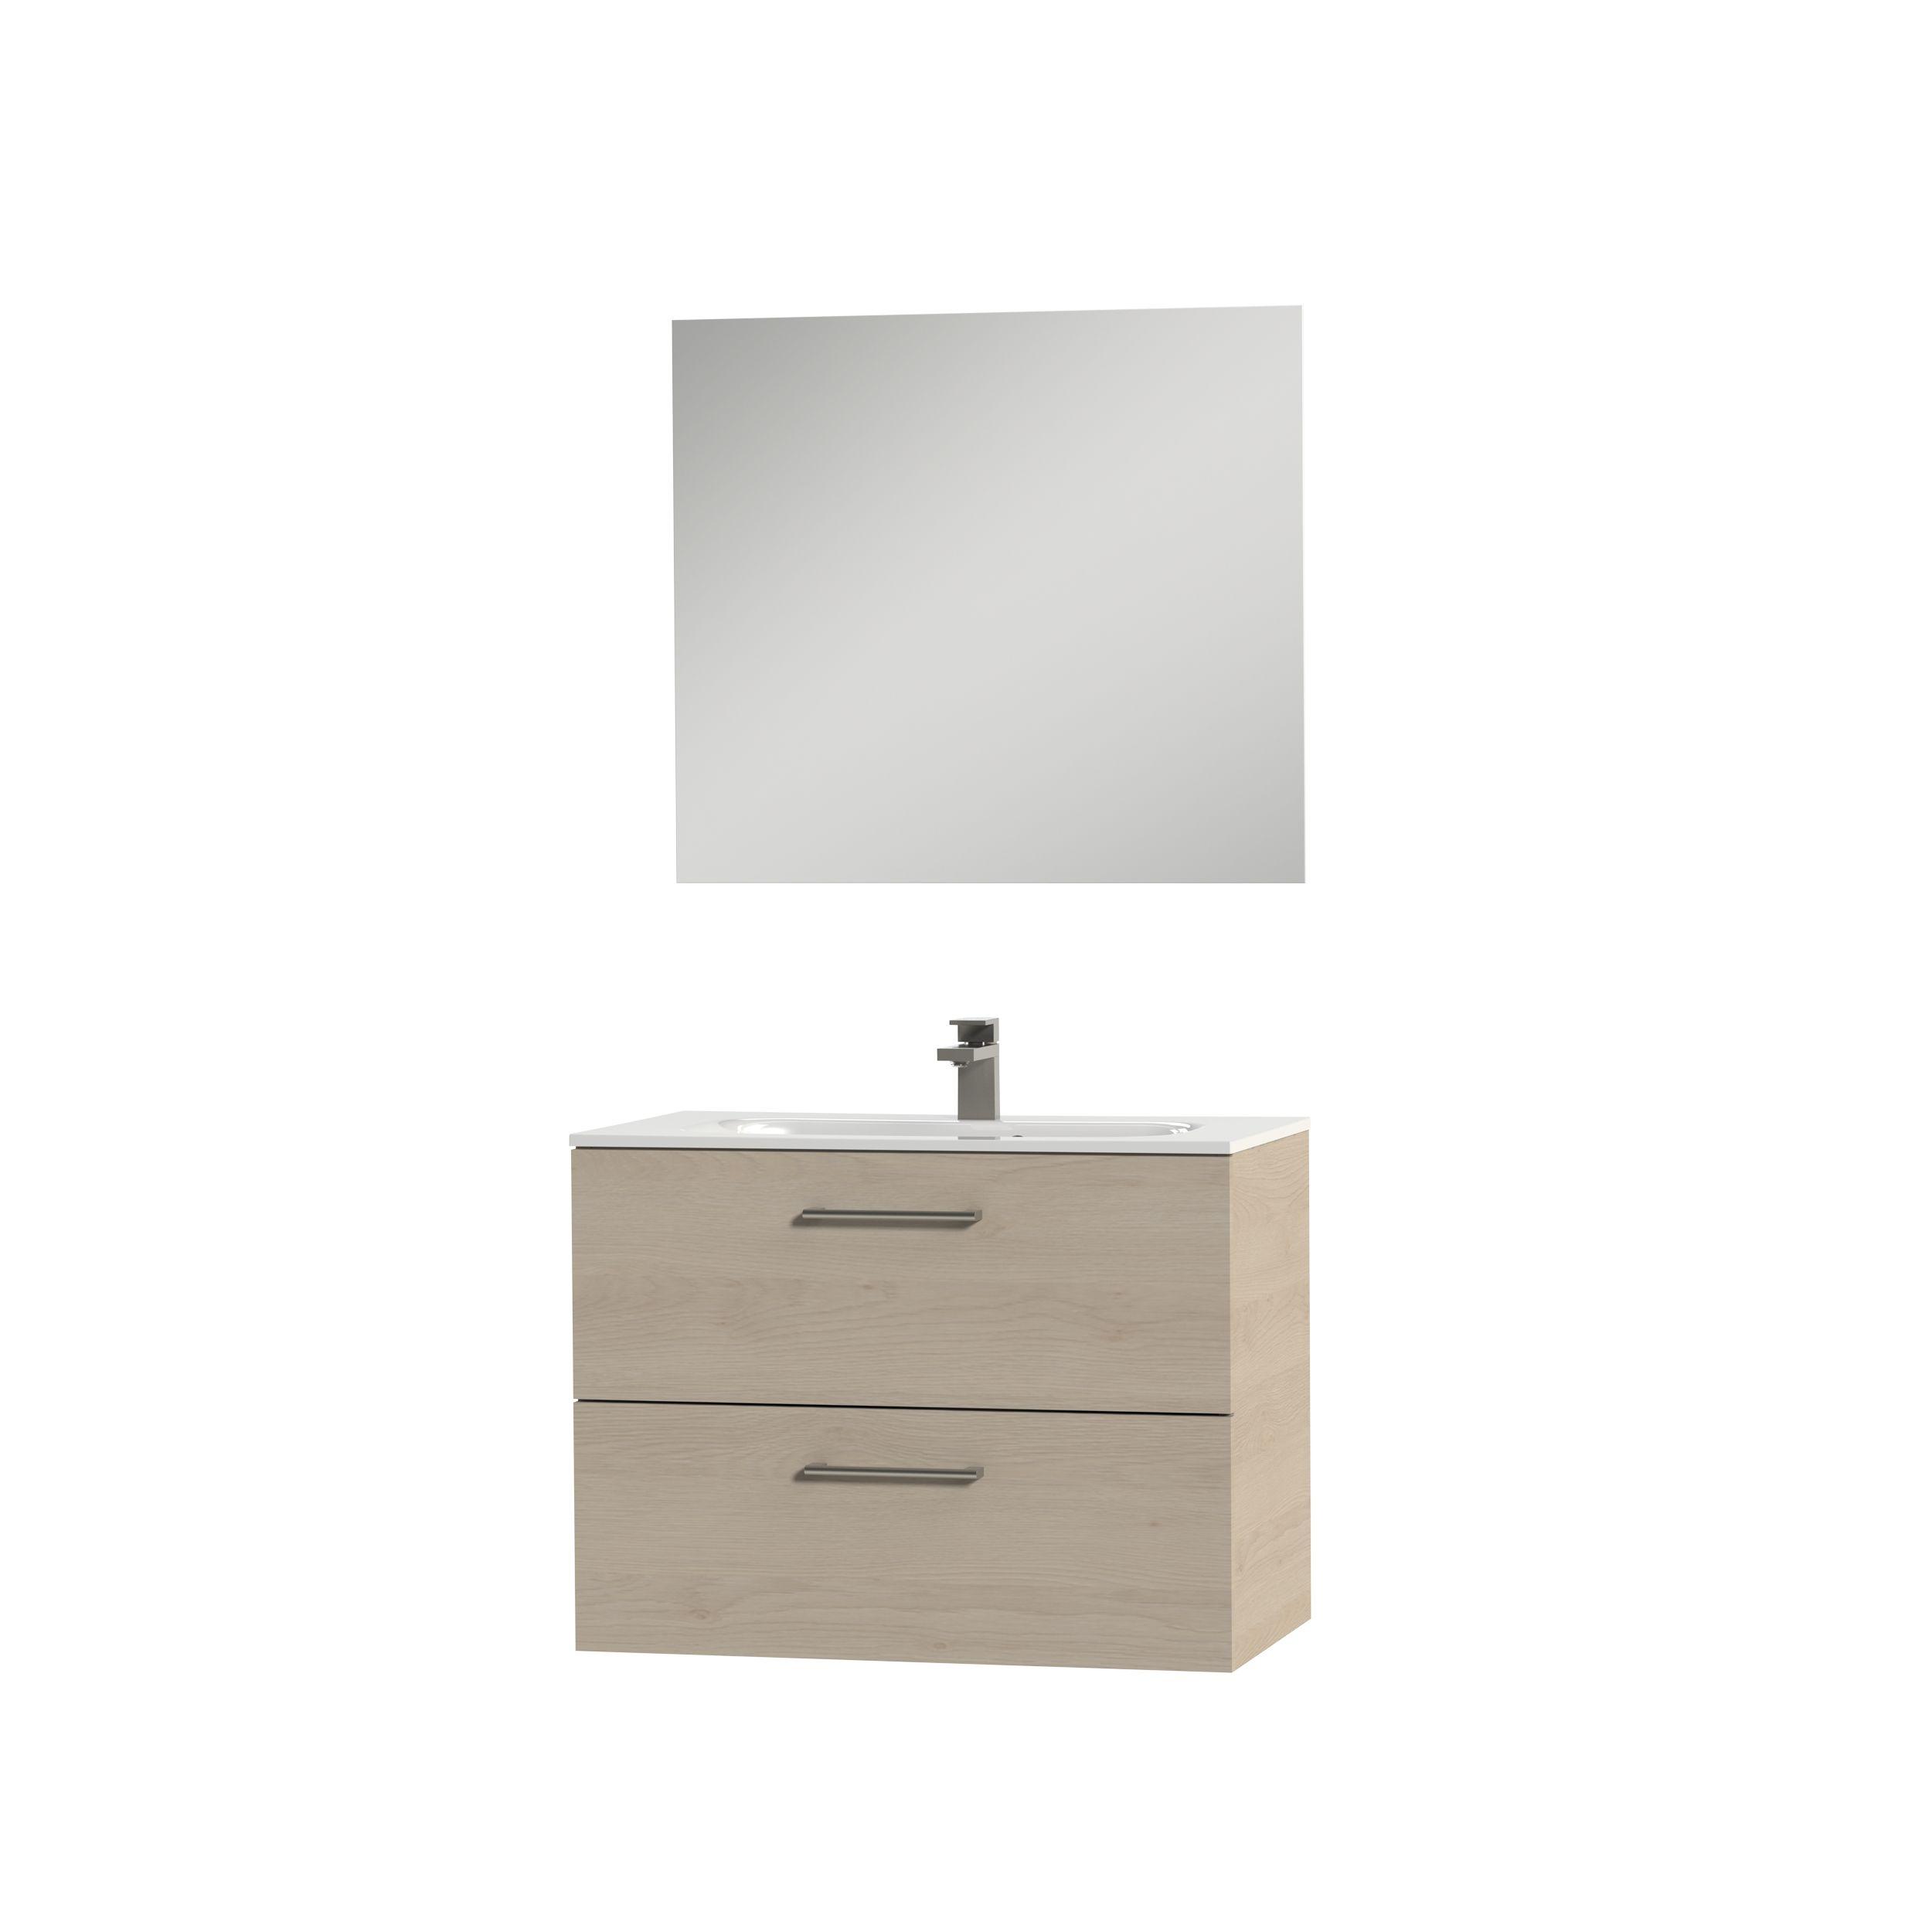 Tiger Studio badkamermeubel incl spiegel en witte wastafel 80cm naturel eiken